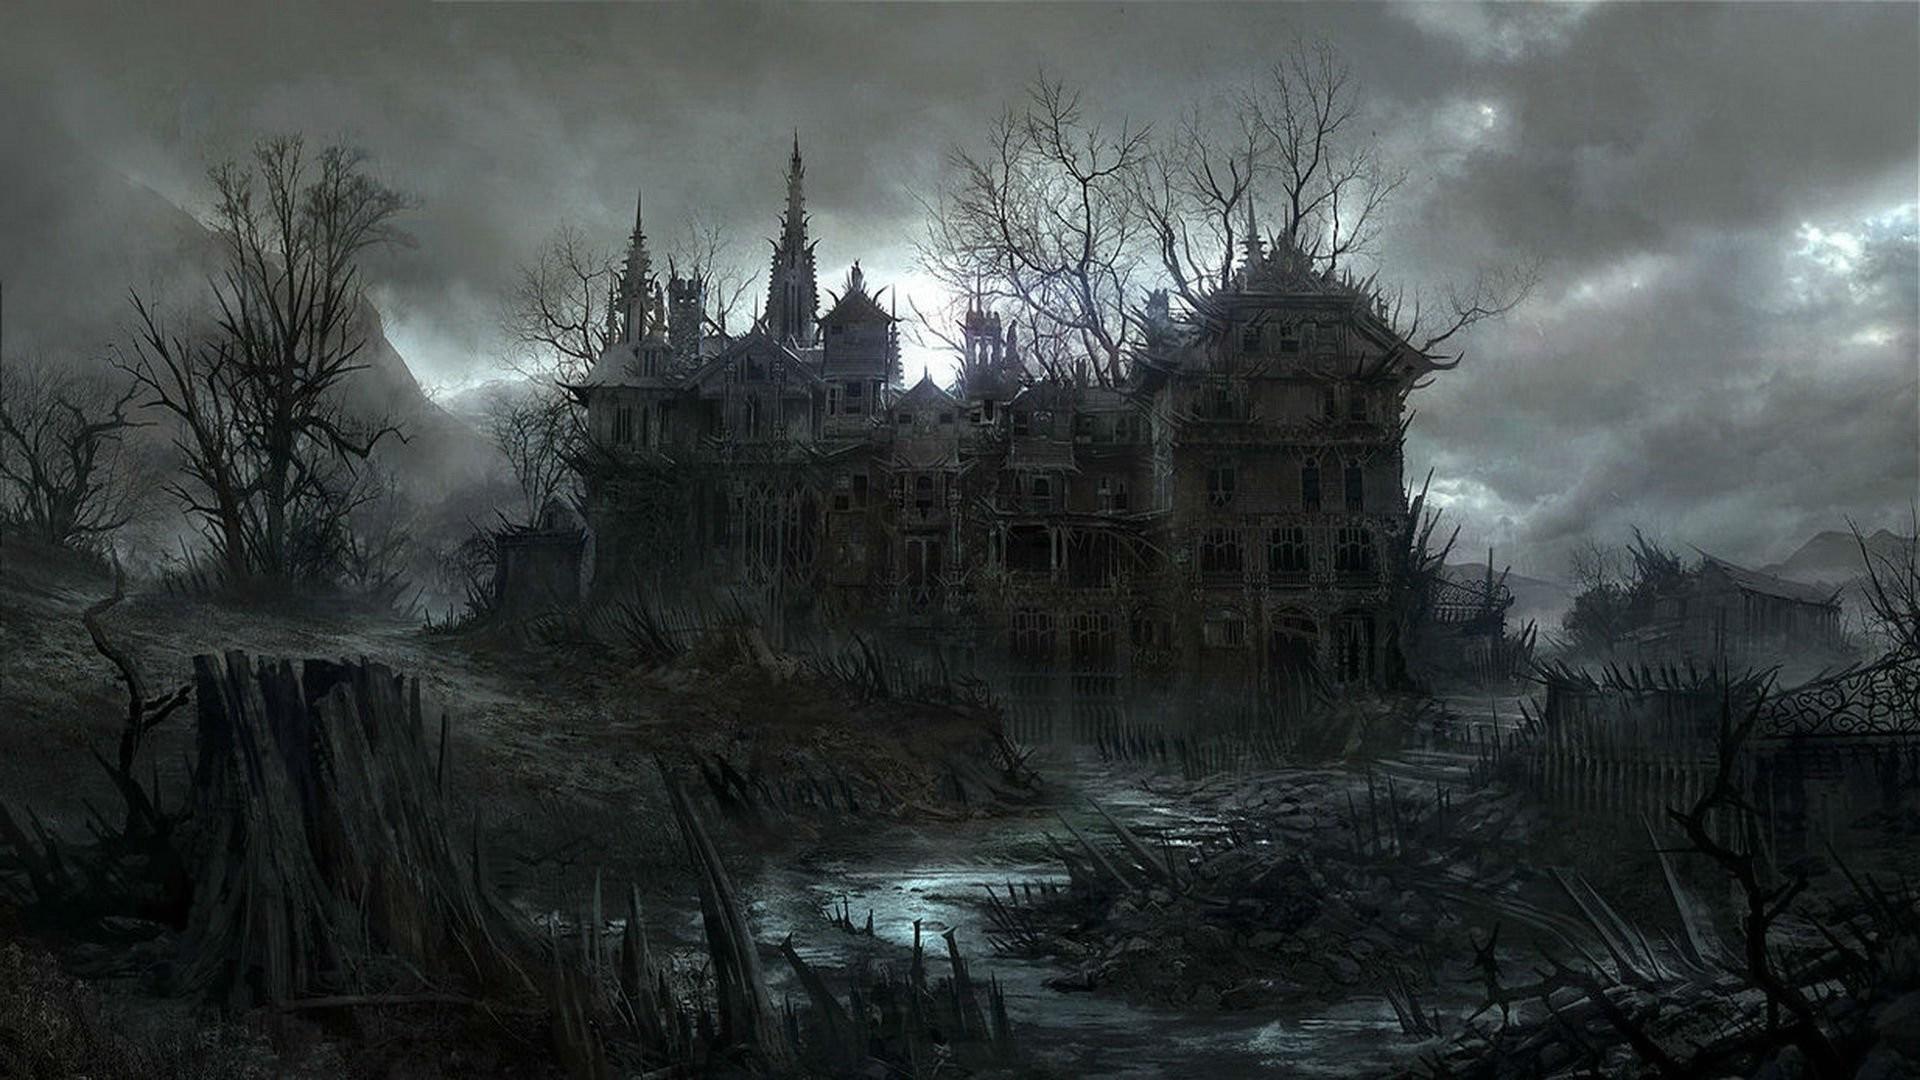 Res: 1920x1080, Spooky ...